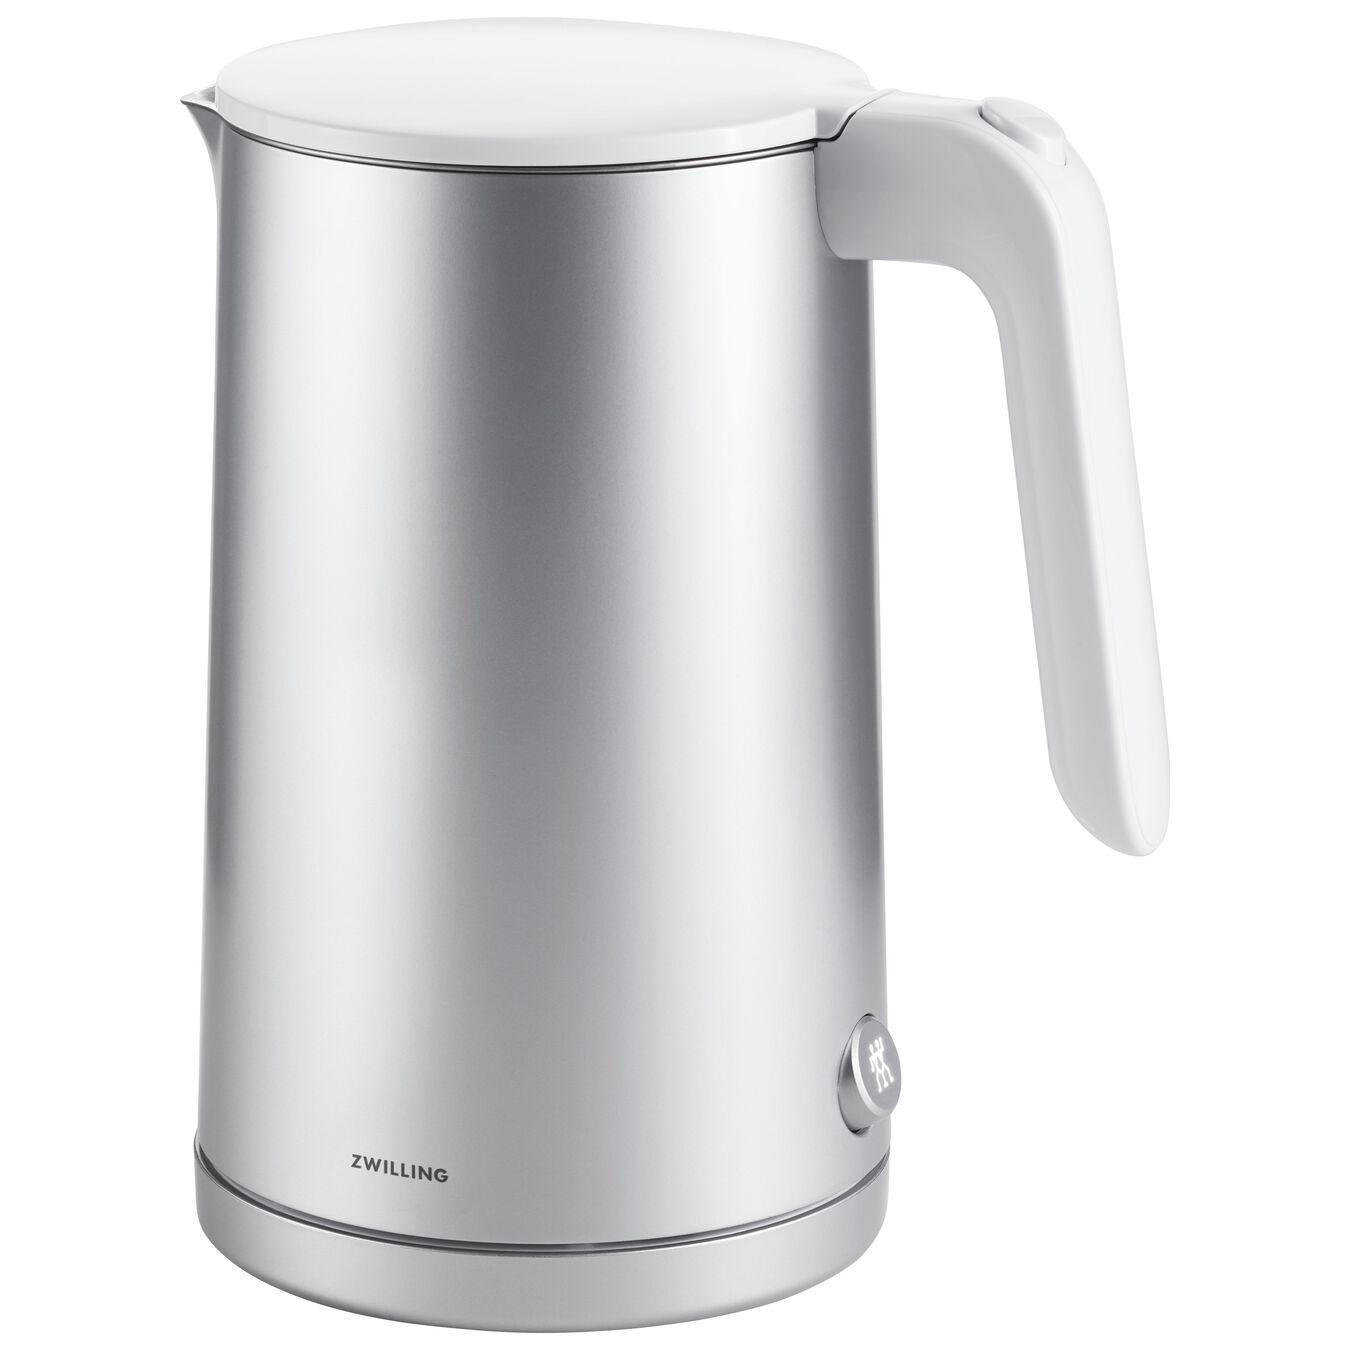 Wasserkocher, 1,5 l, Silber,,large 4